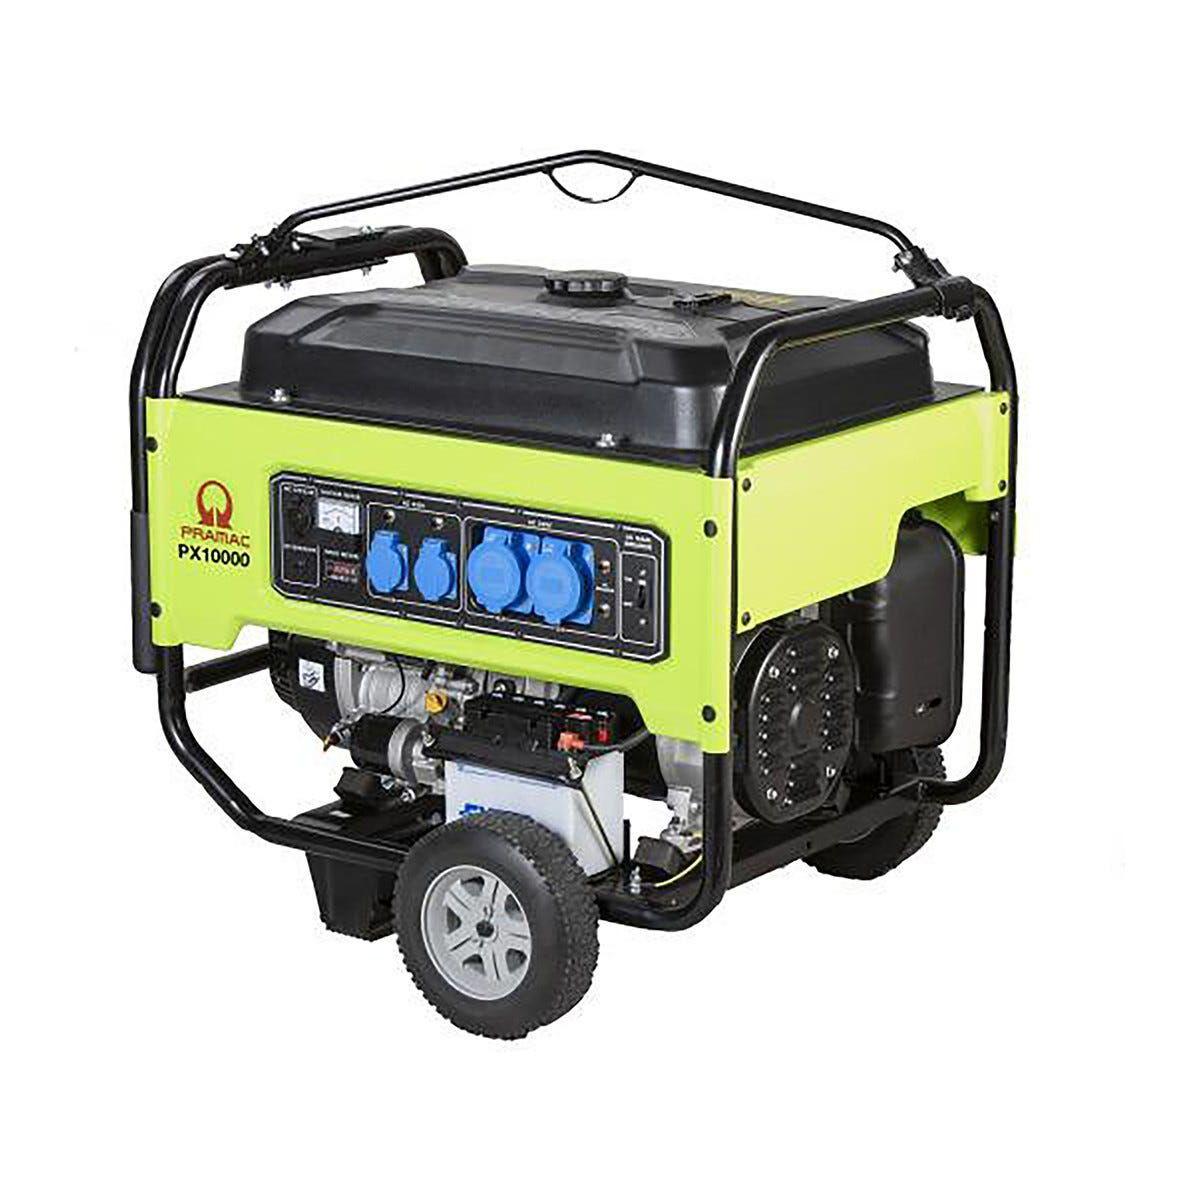 PRAMAC Generatore 9300 W  Px10000 Potenza Continua 8500 W 4 Tempi Benzina